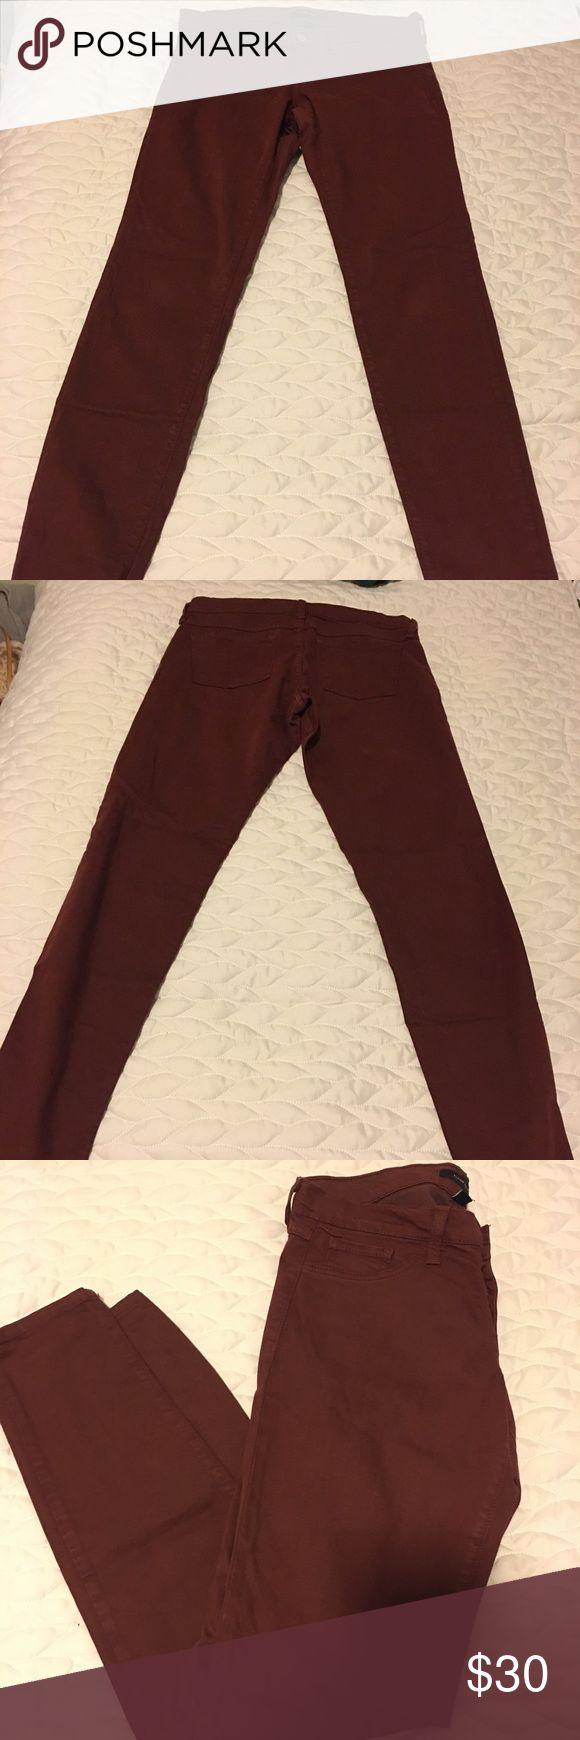 Maroon skinny jeans Flying Monkey 🐒 Flying Monkey skinny jeans size 28 Maroon color. Not faded, in great shape. Rarely worn. flying monkey Jeans Skinny